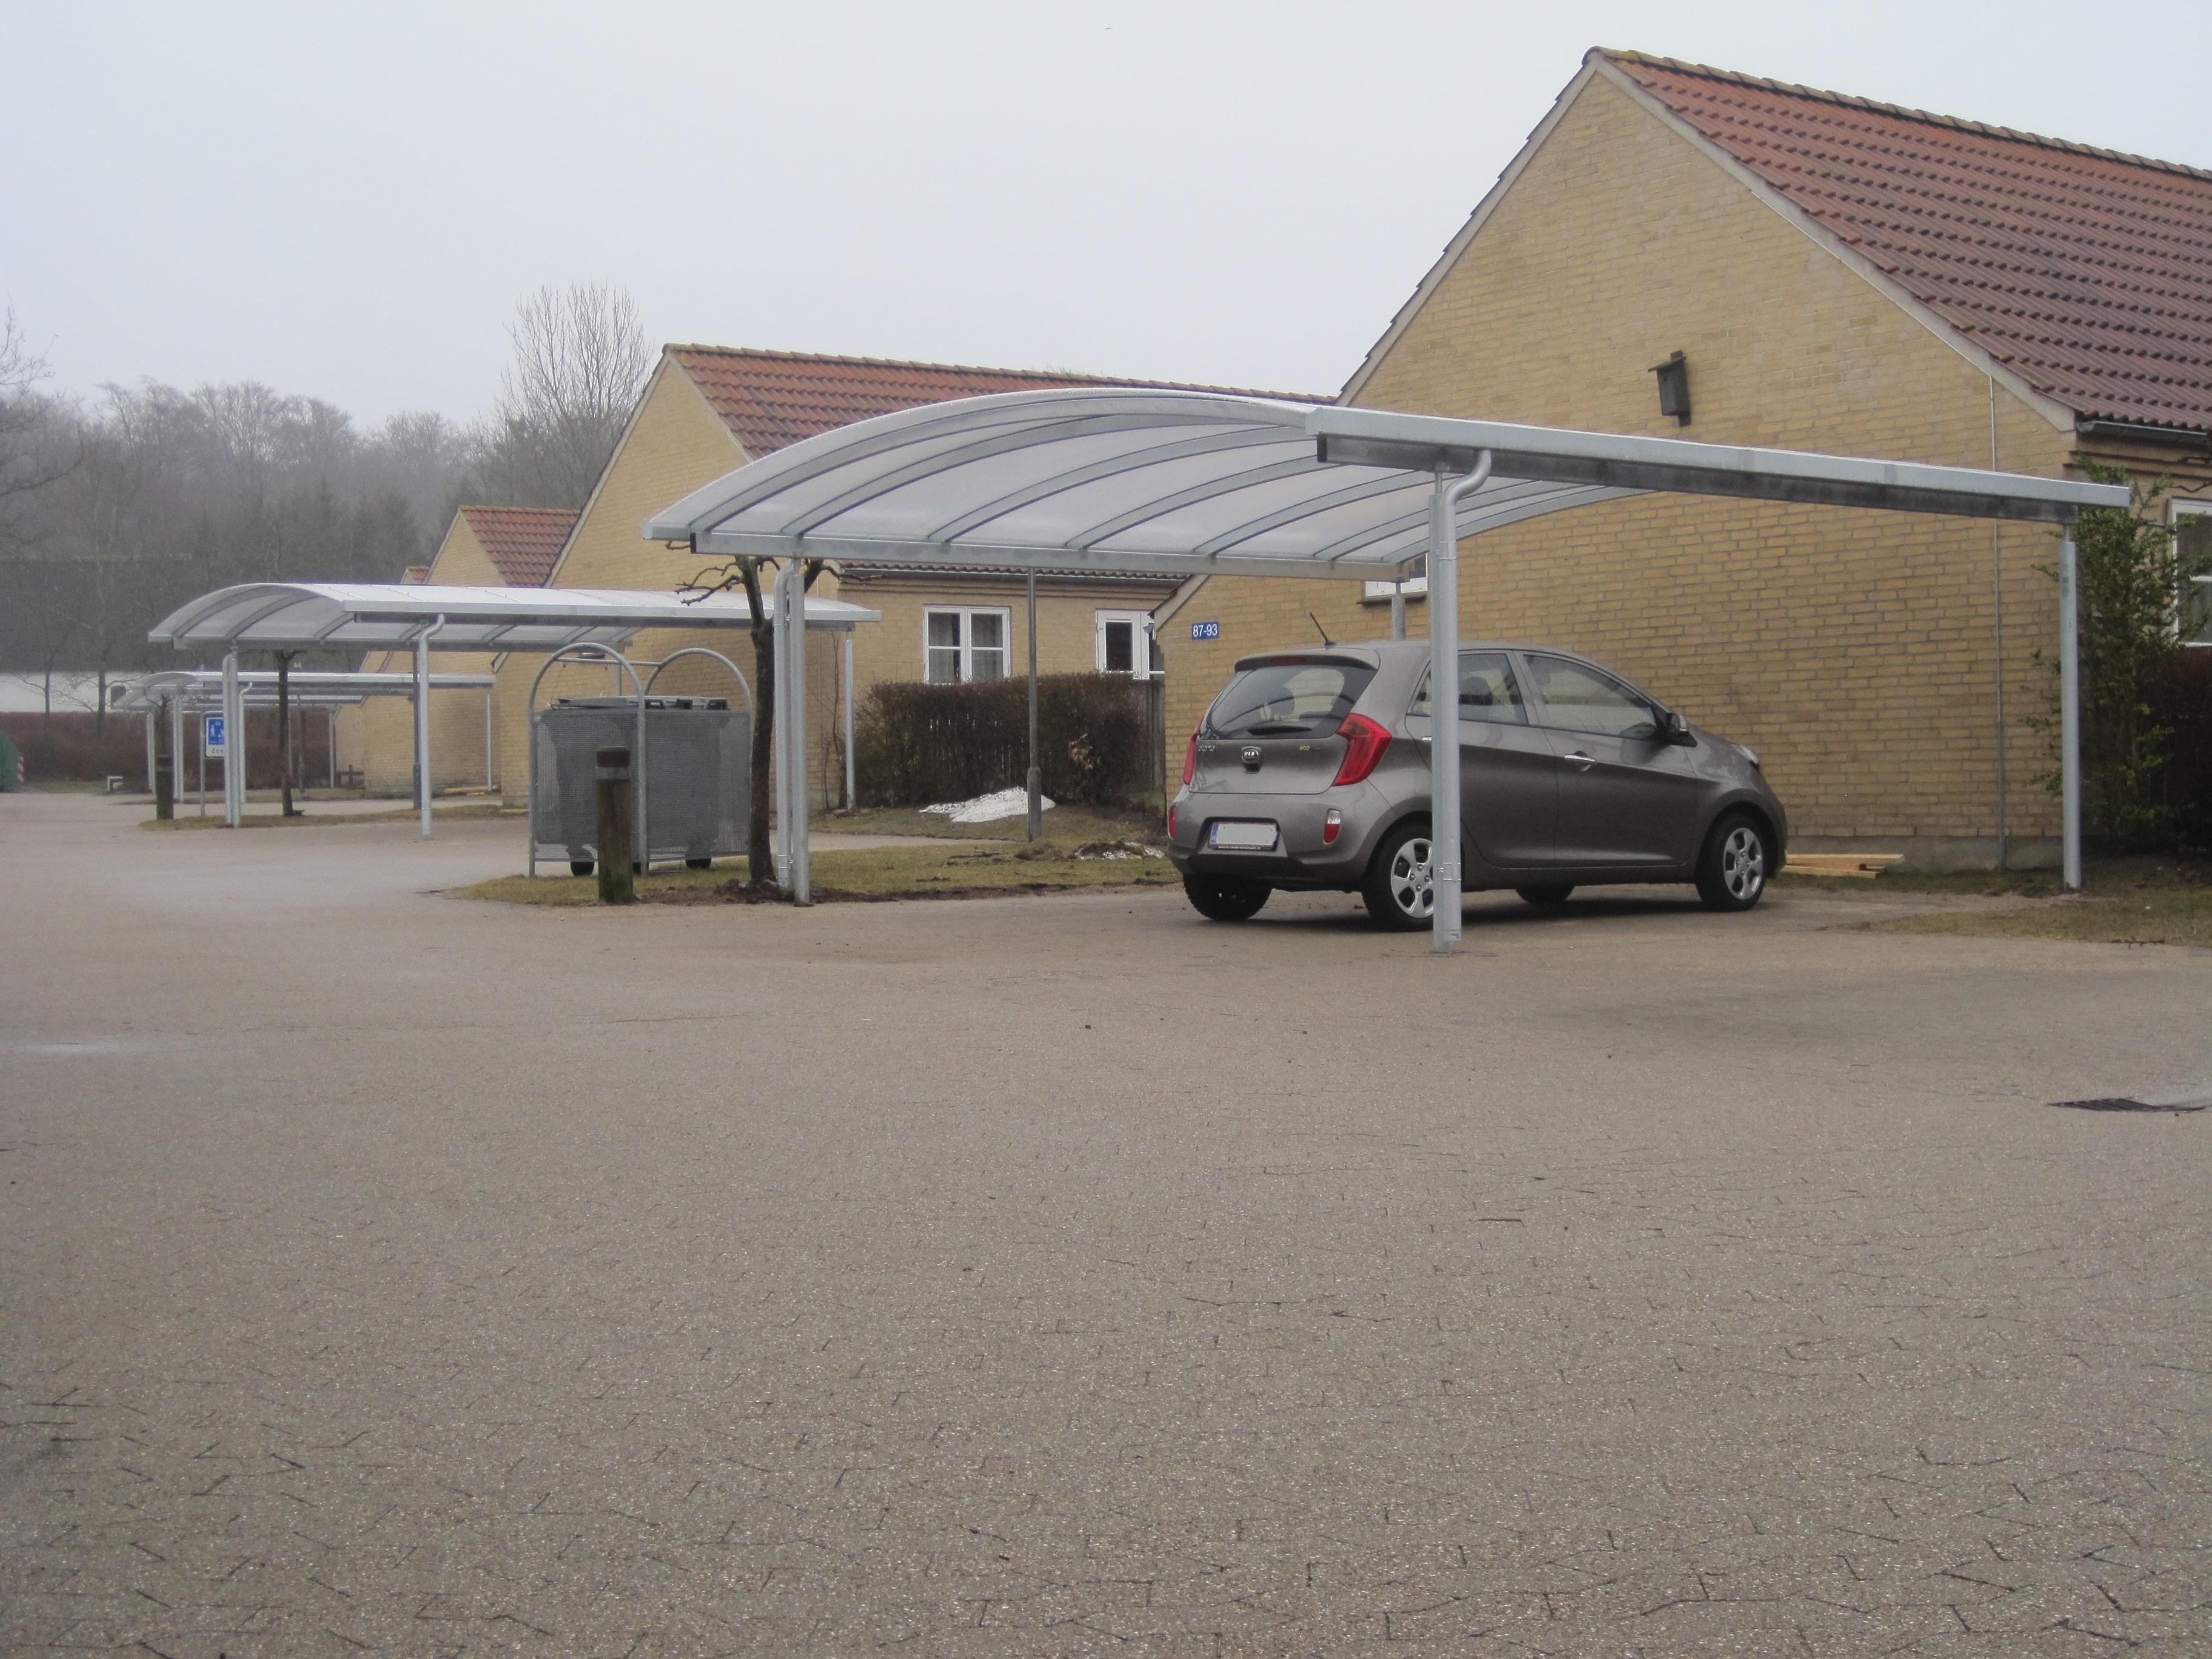 Galerie bogendach stahl carports carport nord carport for Carport angebot